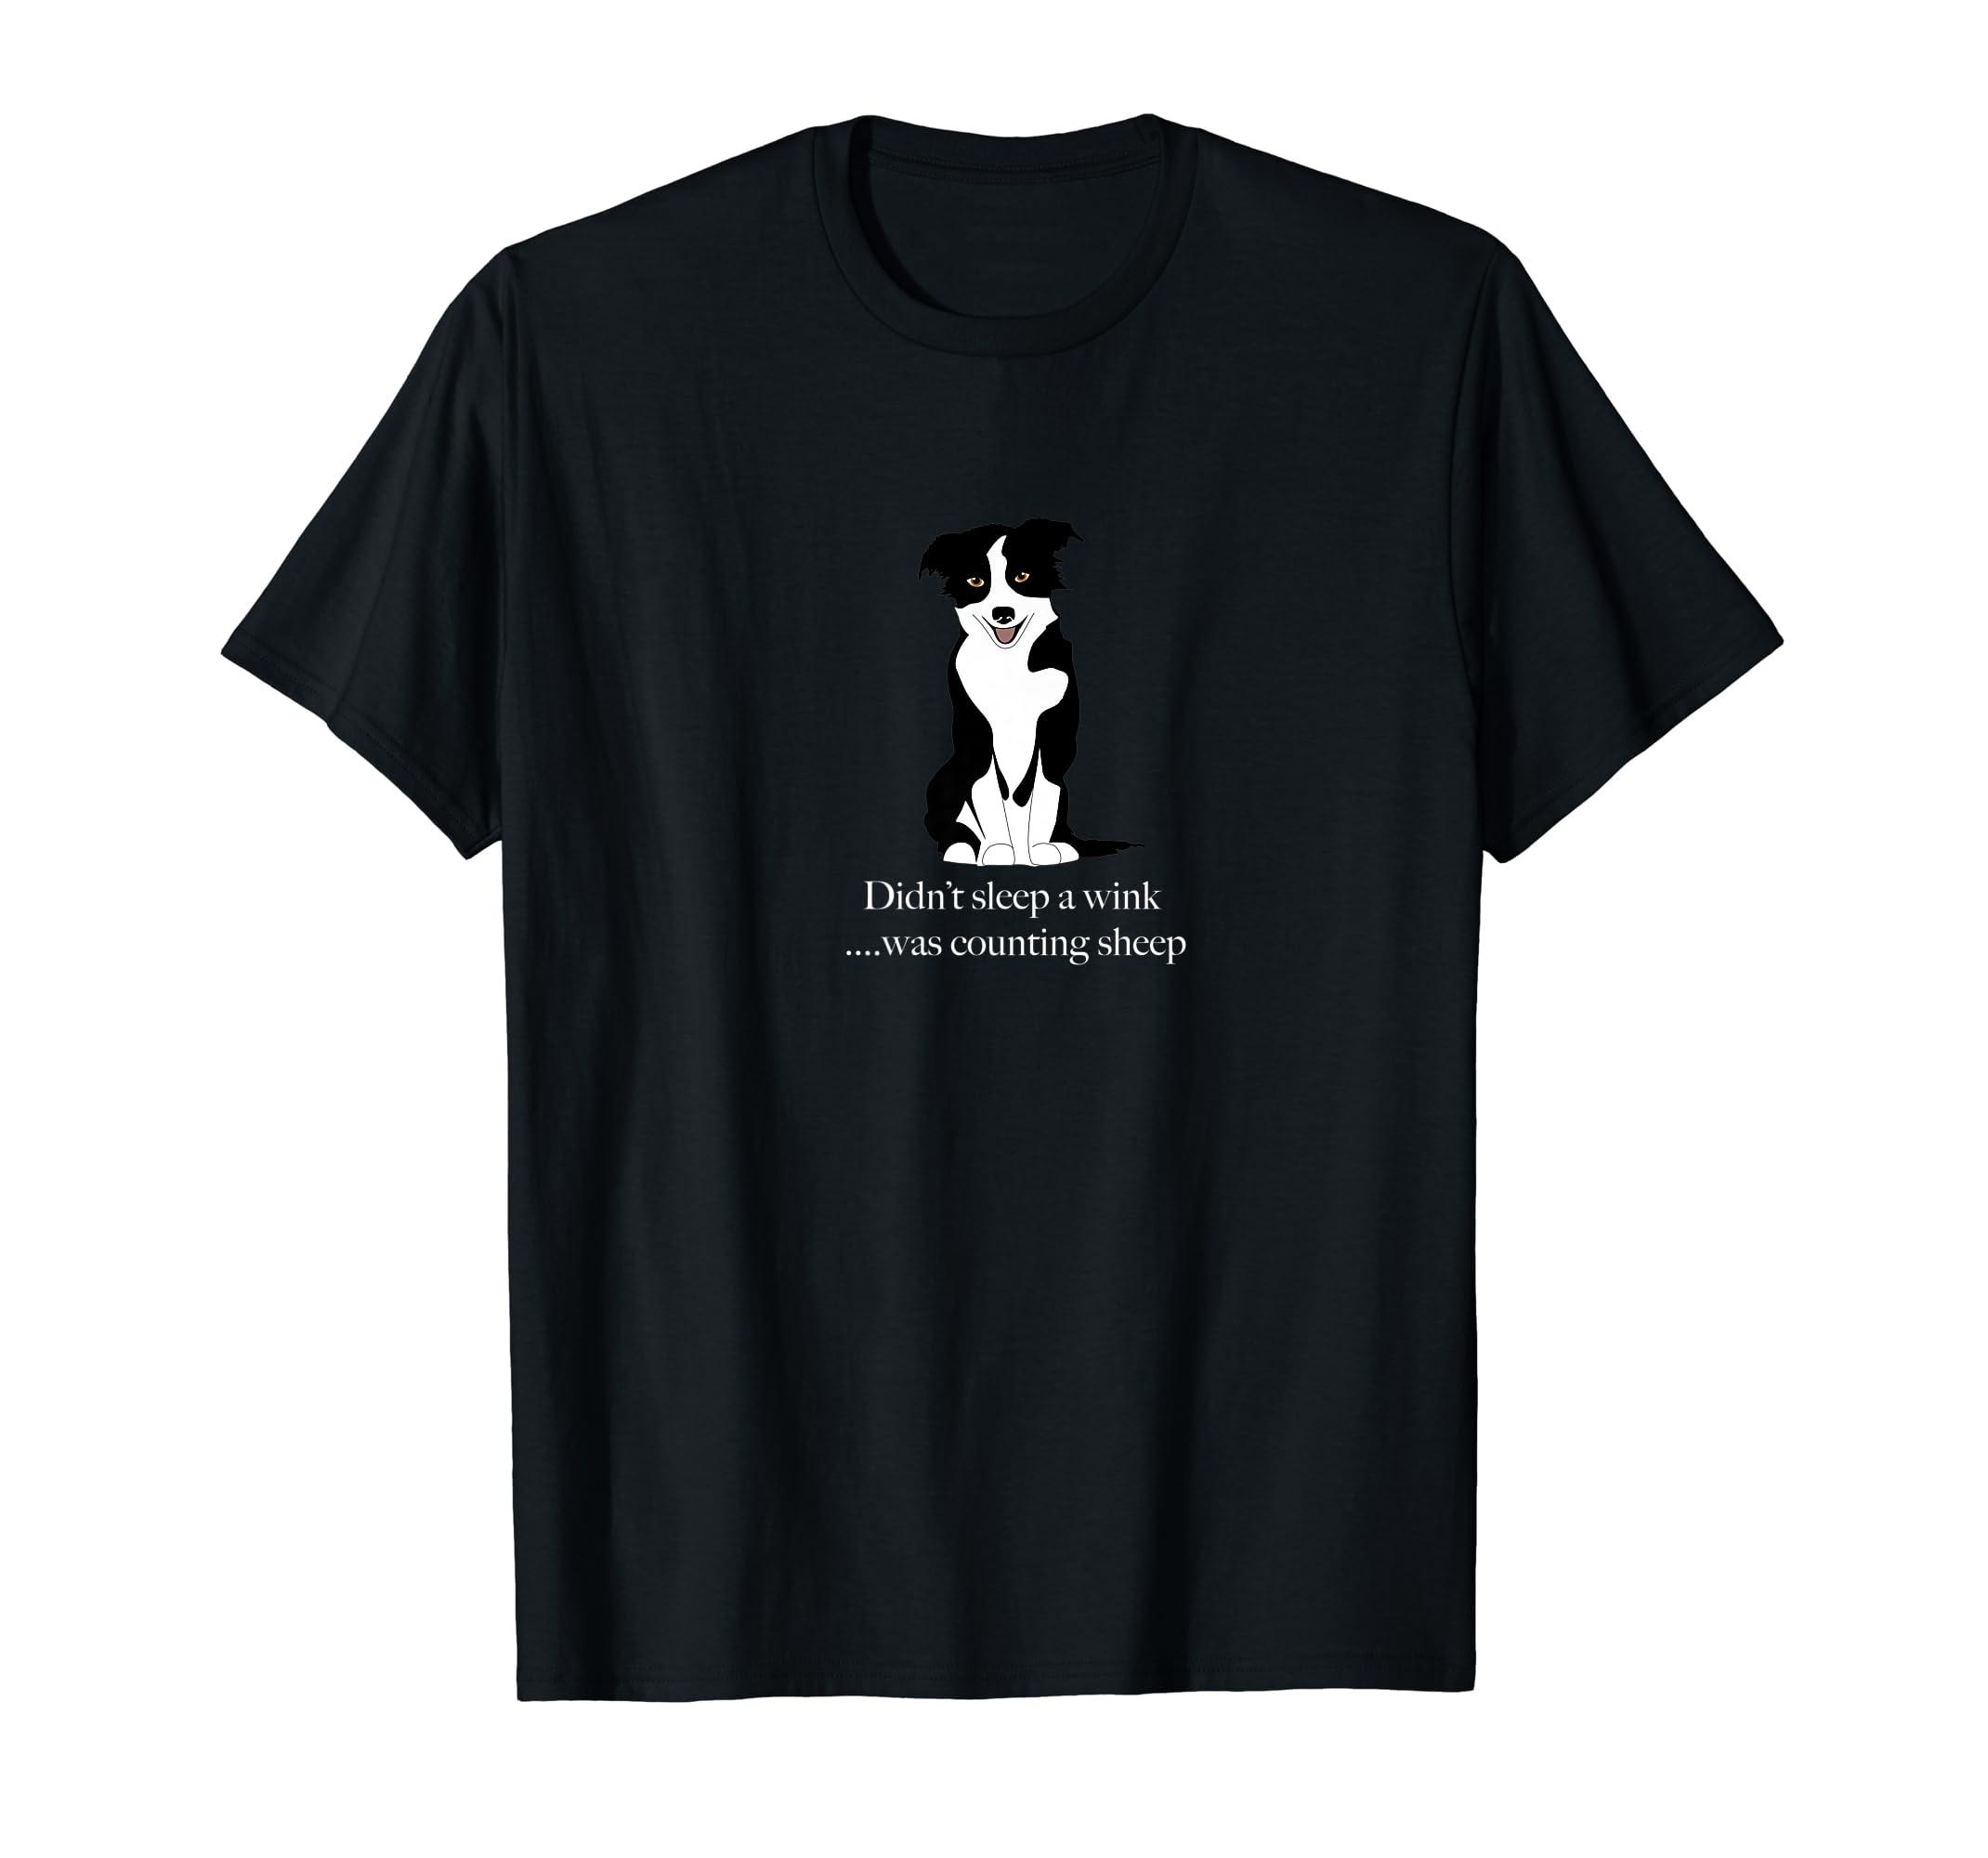 Border Collie Counting Sheep Shirt - Funny things herding do-Men's T-Shirt-Black